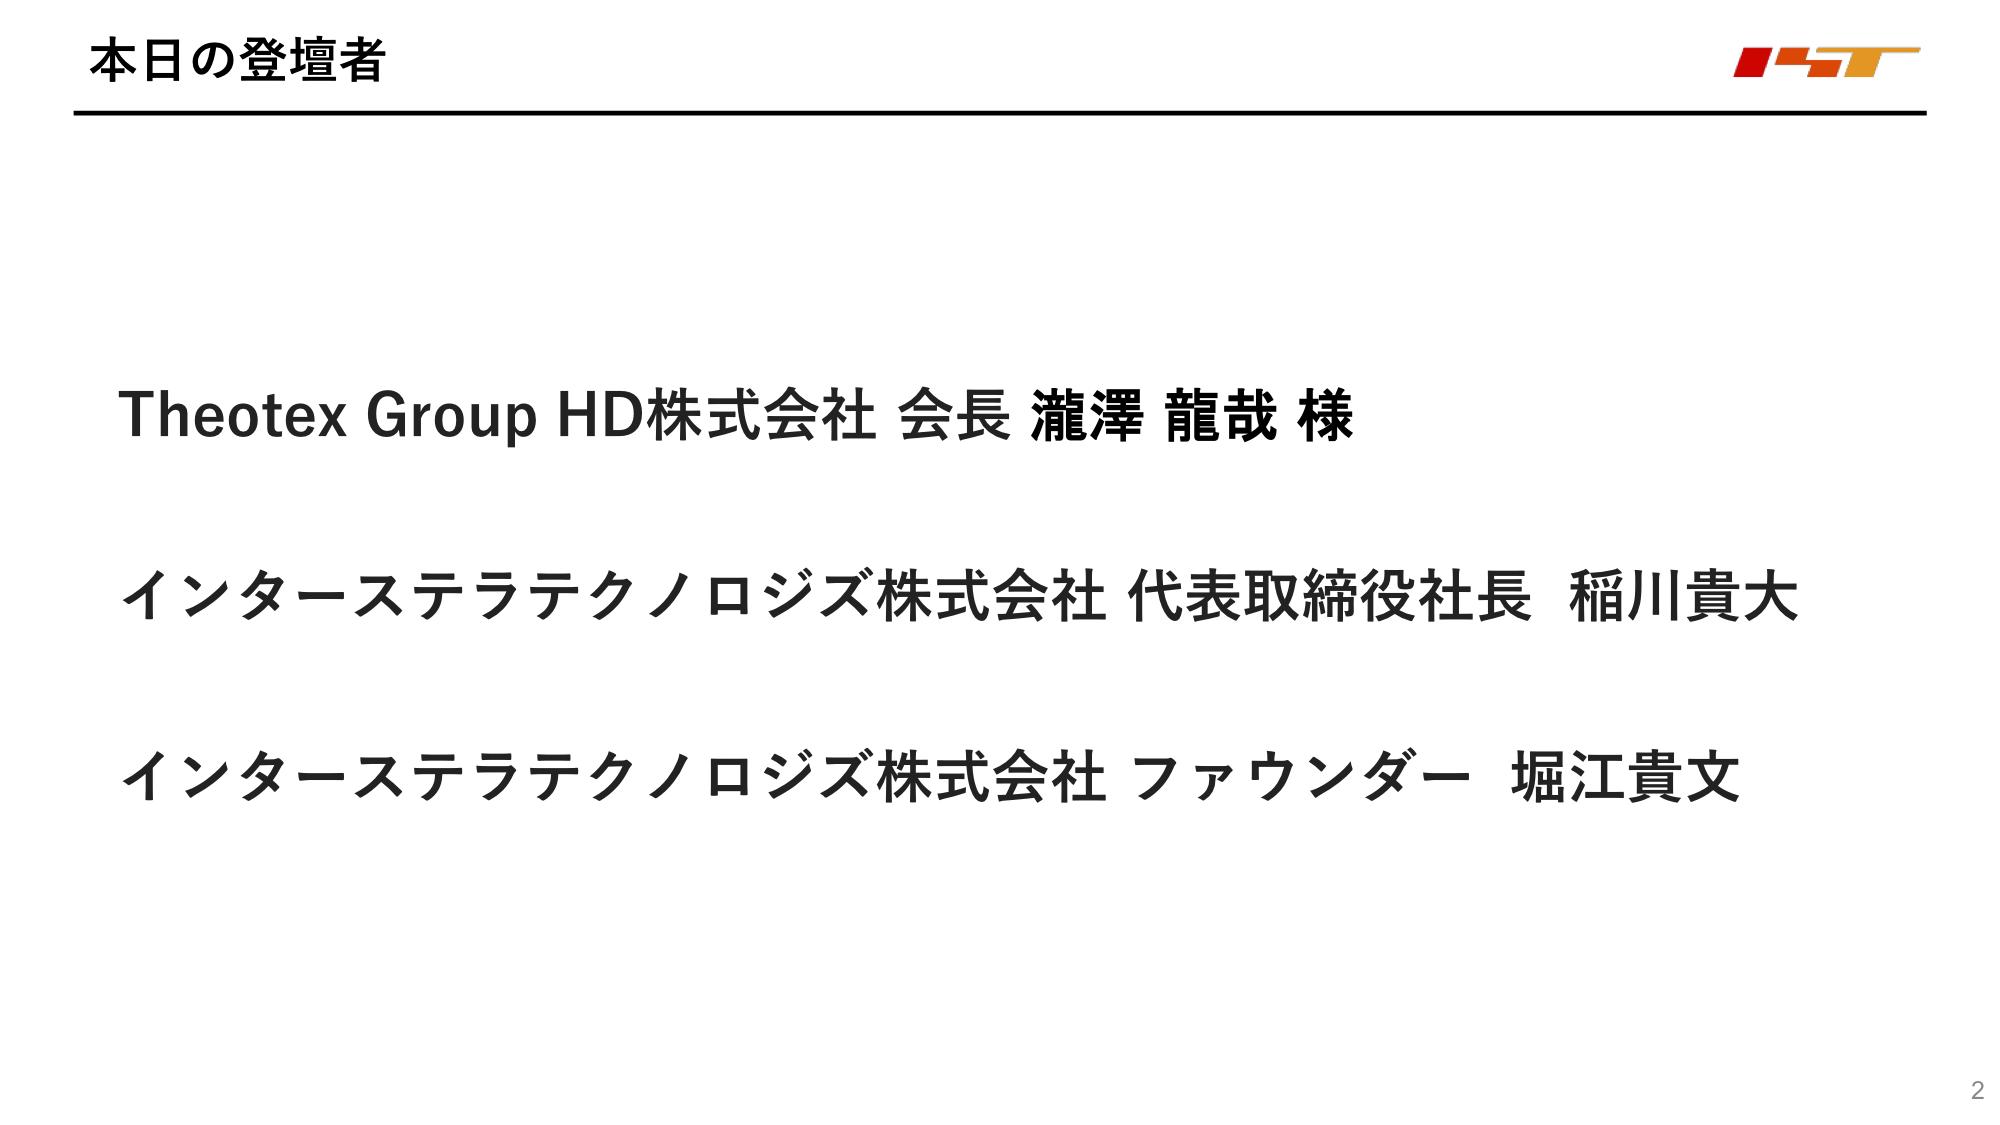 f:id:Imamura:20200603232705p:plain